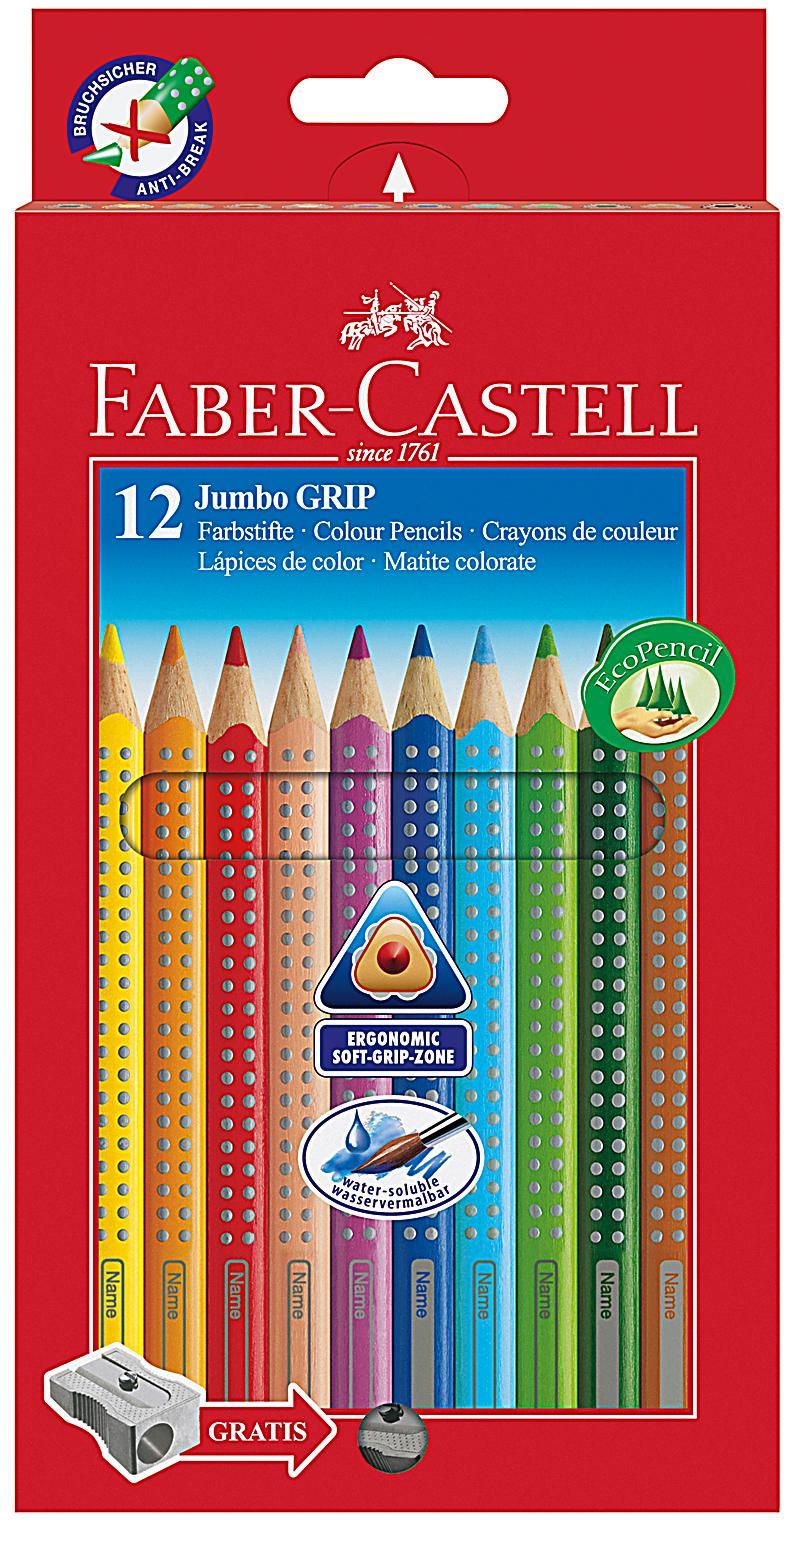 faber castell jumbo grip 12 farbstifte und spitzer. Black Bedroom Furniture Sets. Home Design Ideas